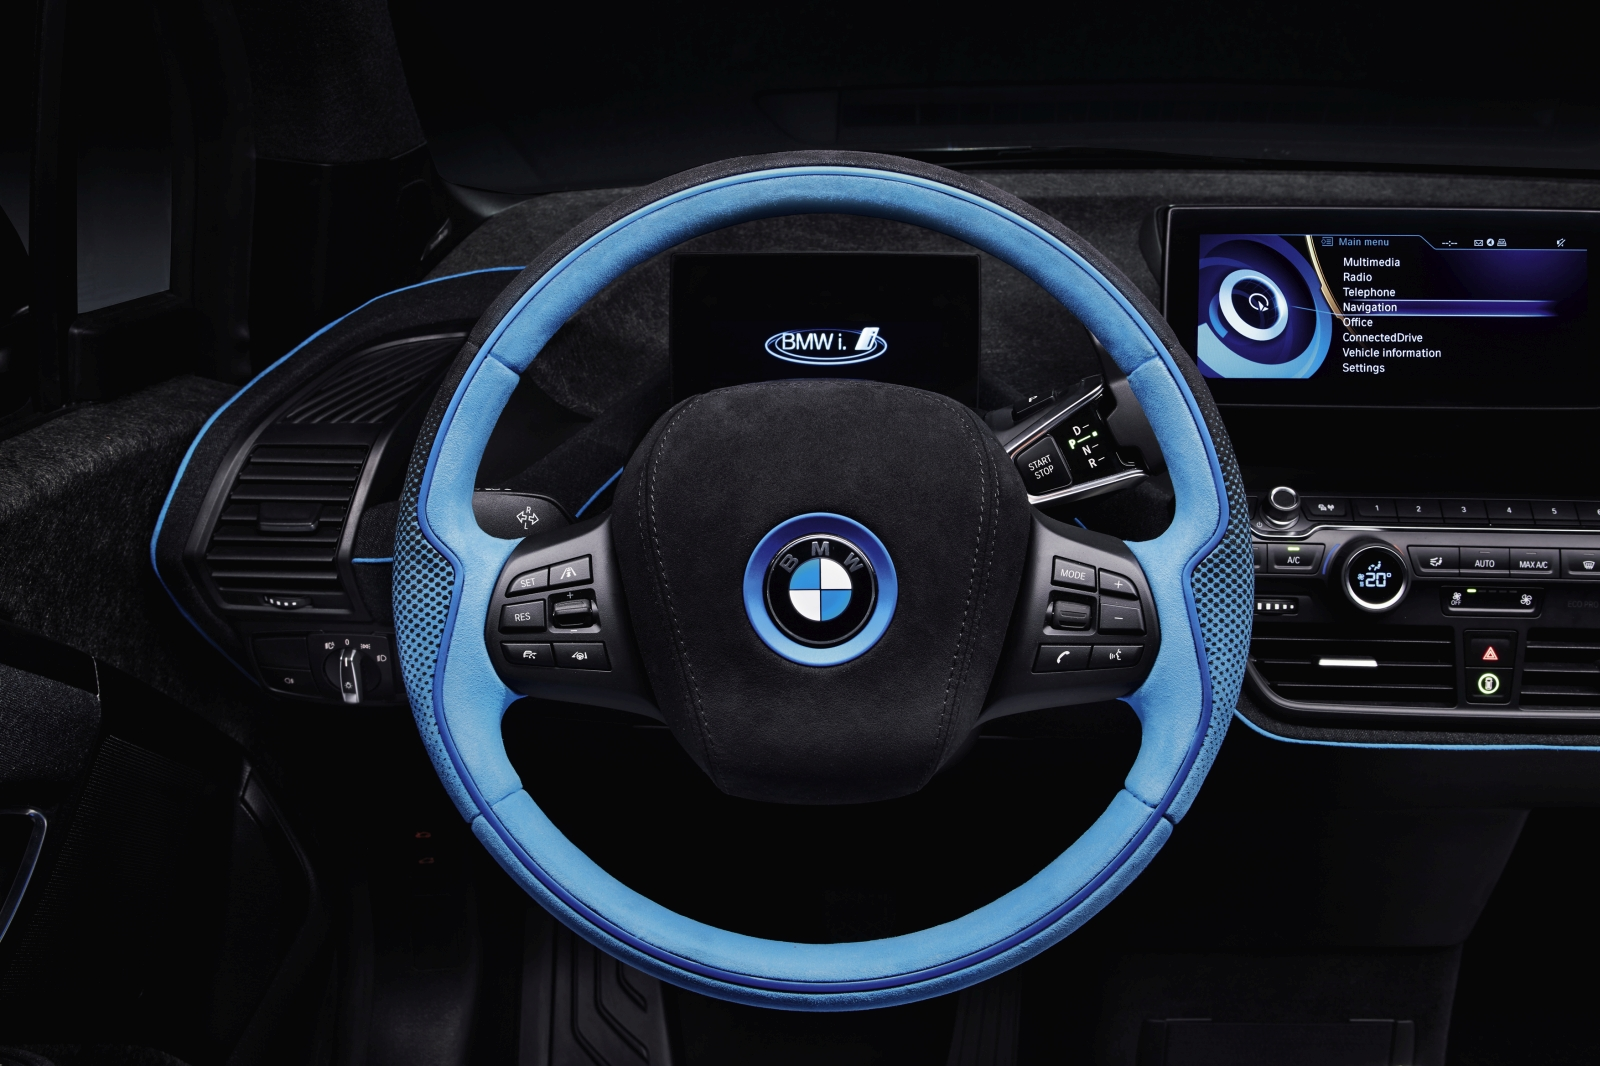 BMW i3 Garage Italia CrossFade és BMW i8 Garage Italia CrossFade